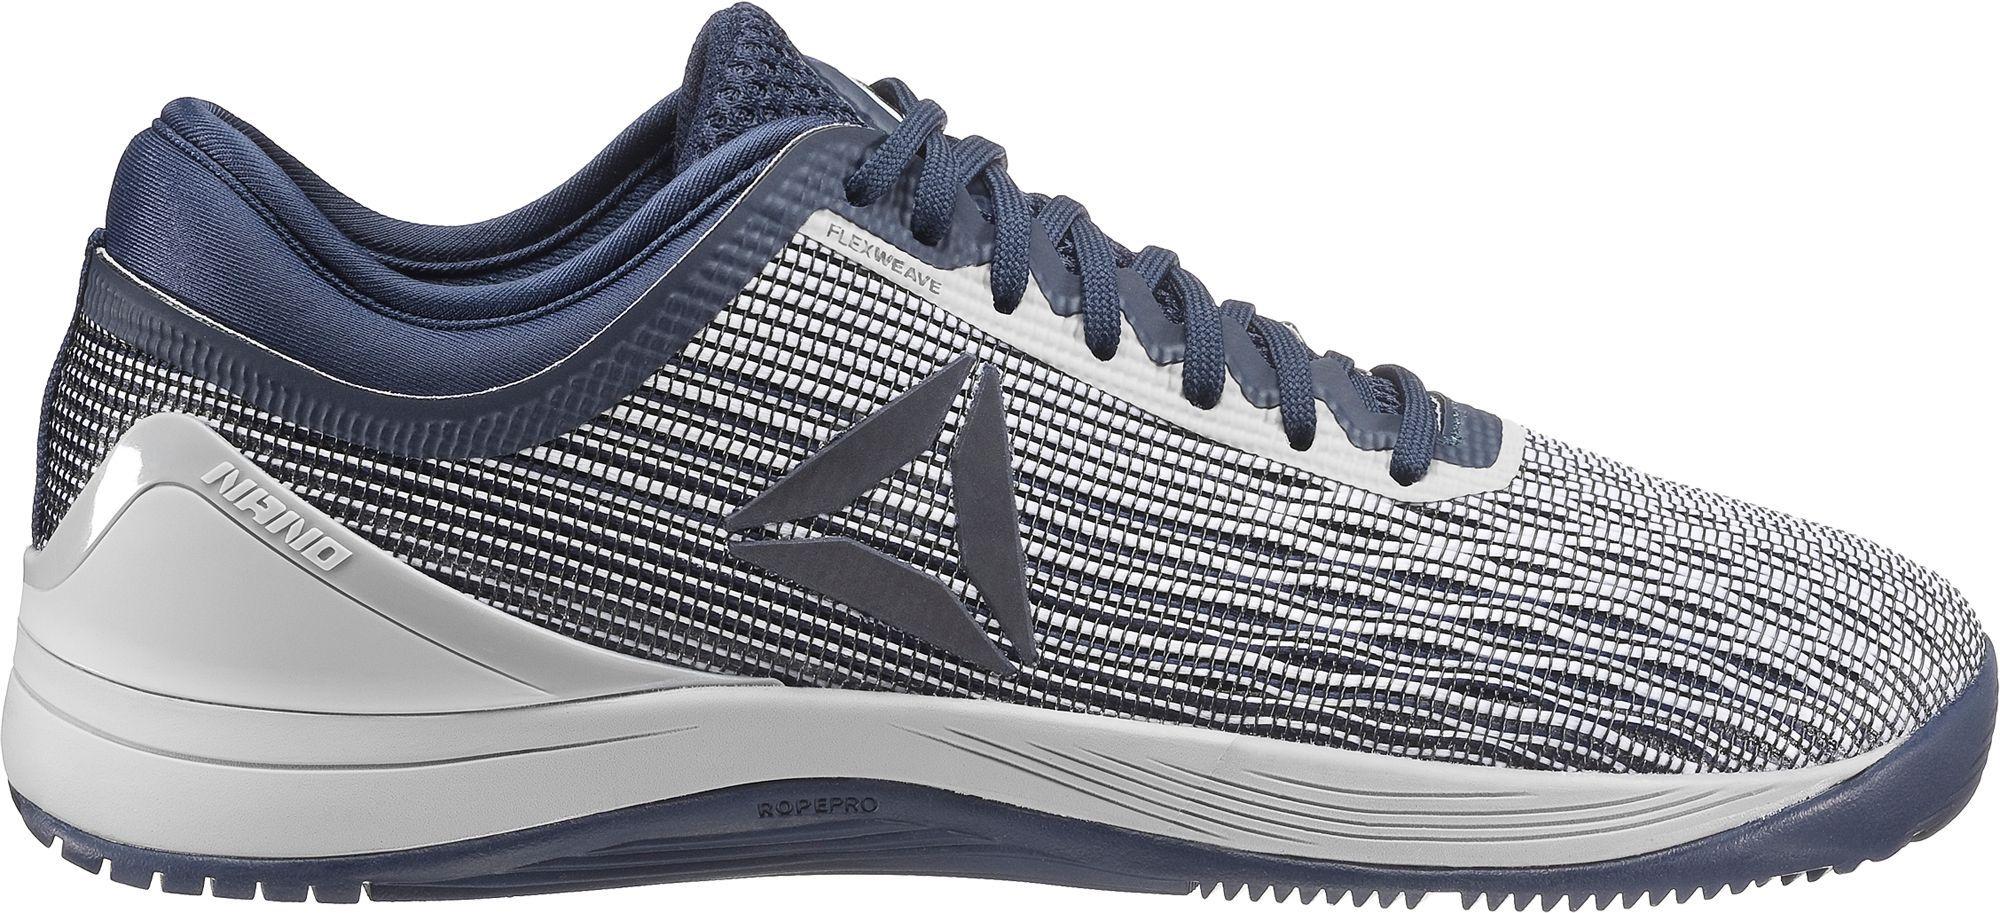 Reebok Men s CrossFit Nano 8.0 Flexweave Training Shoes  7cb7378d5